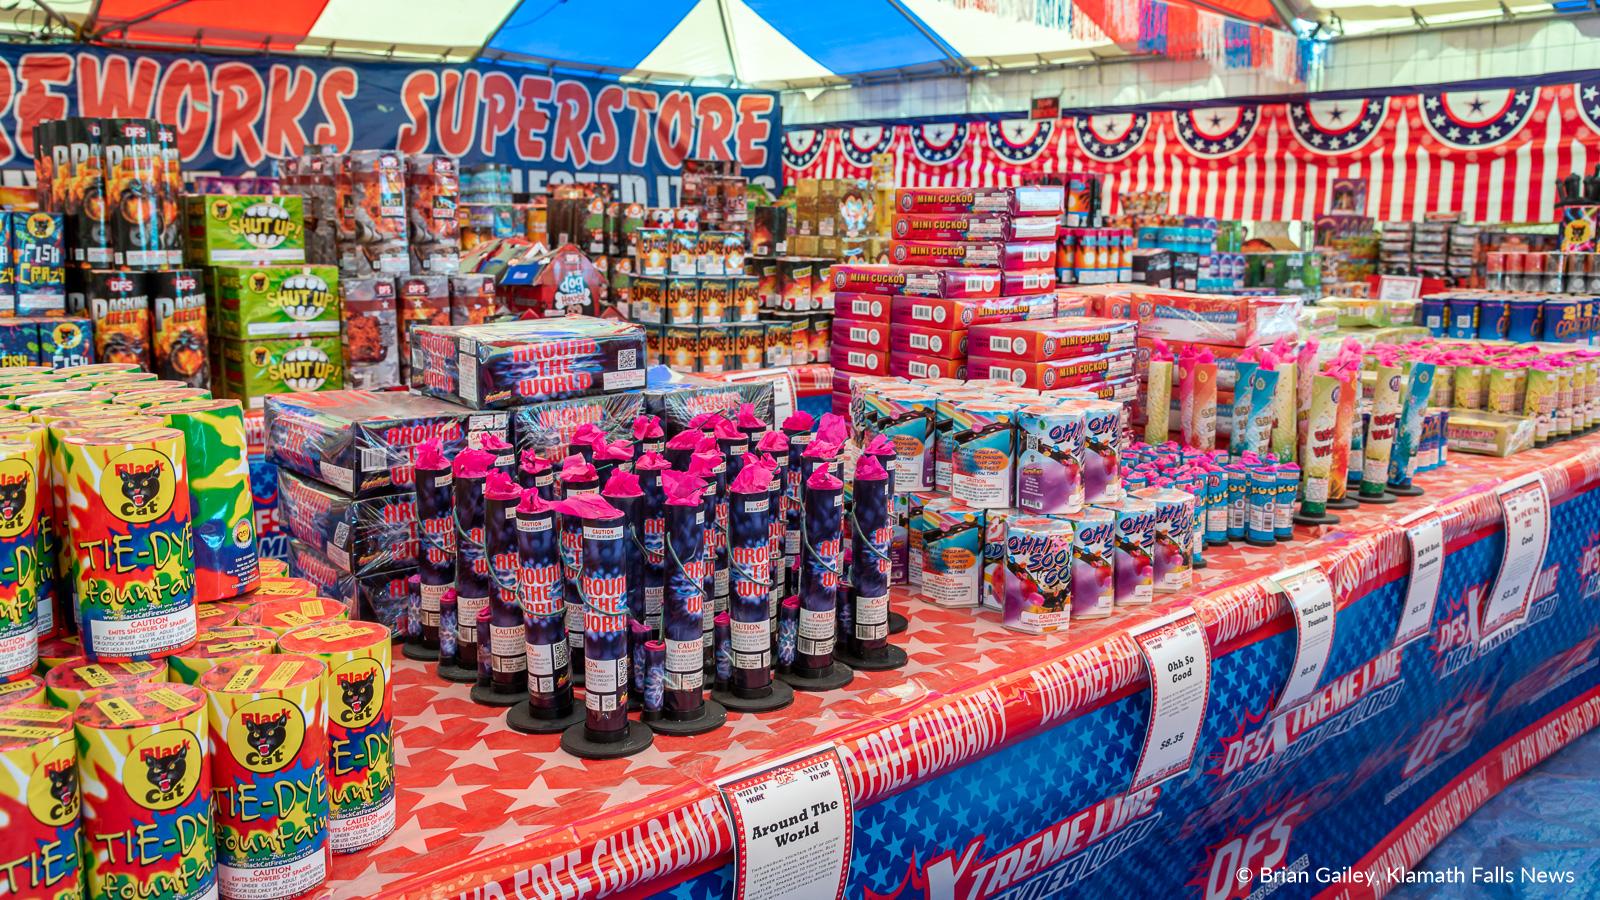 Legal Oregon fireworks for sale at Discount Fireworks Superstore on Washburn Way in Klamath Falls. June 28, 2019 (Image, Brian Gailey / Klamath Falls News)